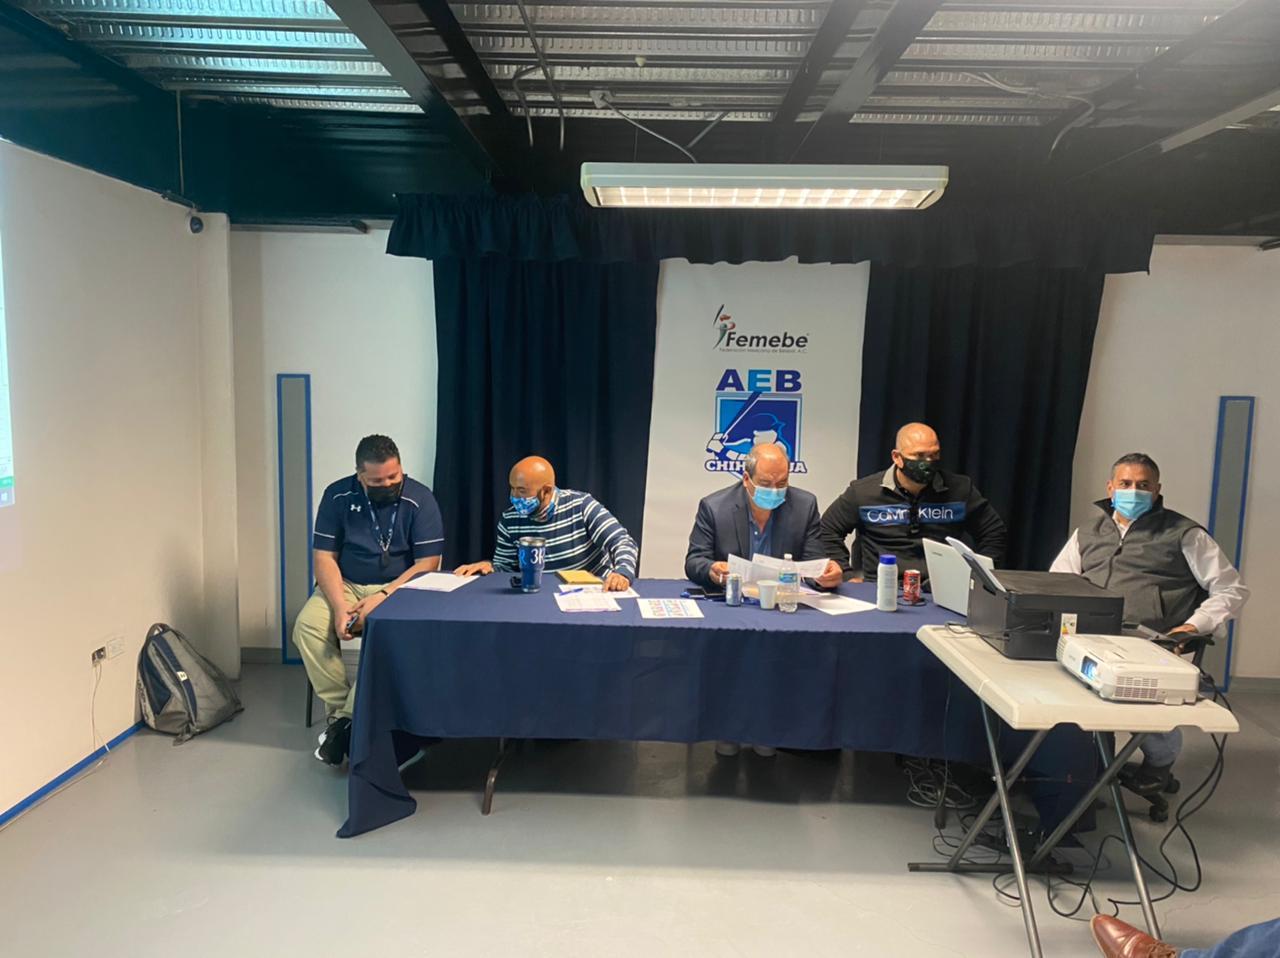 Tercera-Asamblea-2021-beisbol-chihuahua-campeonato-junta